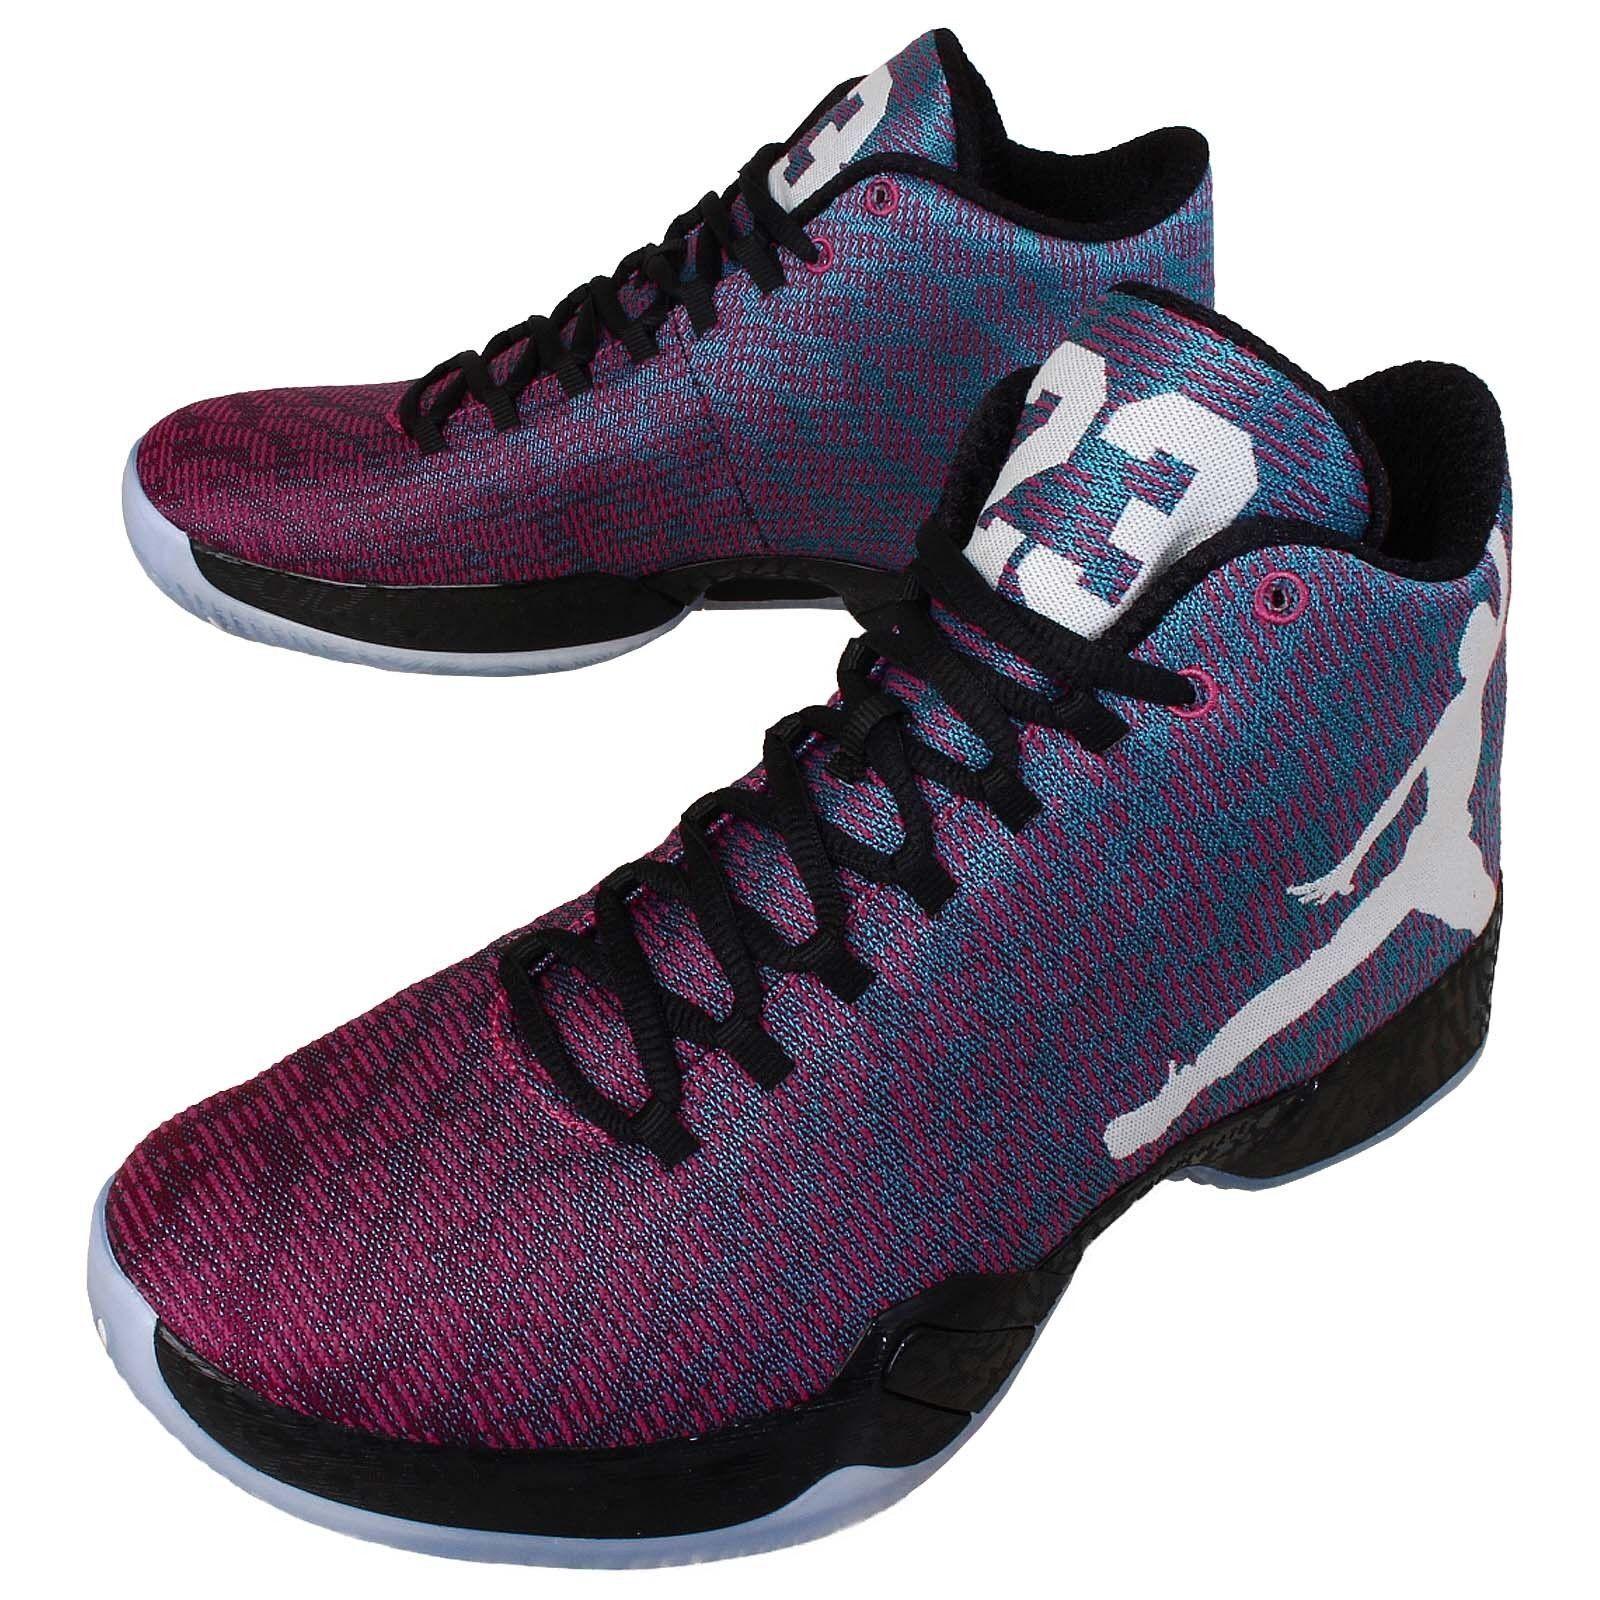 Adidas crazylight boost low 2016 bred black red mens basketball shoes - Nike Air Jordan Xx9